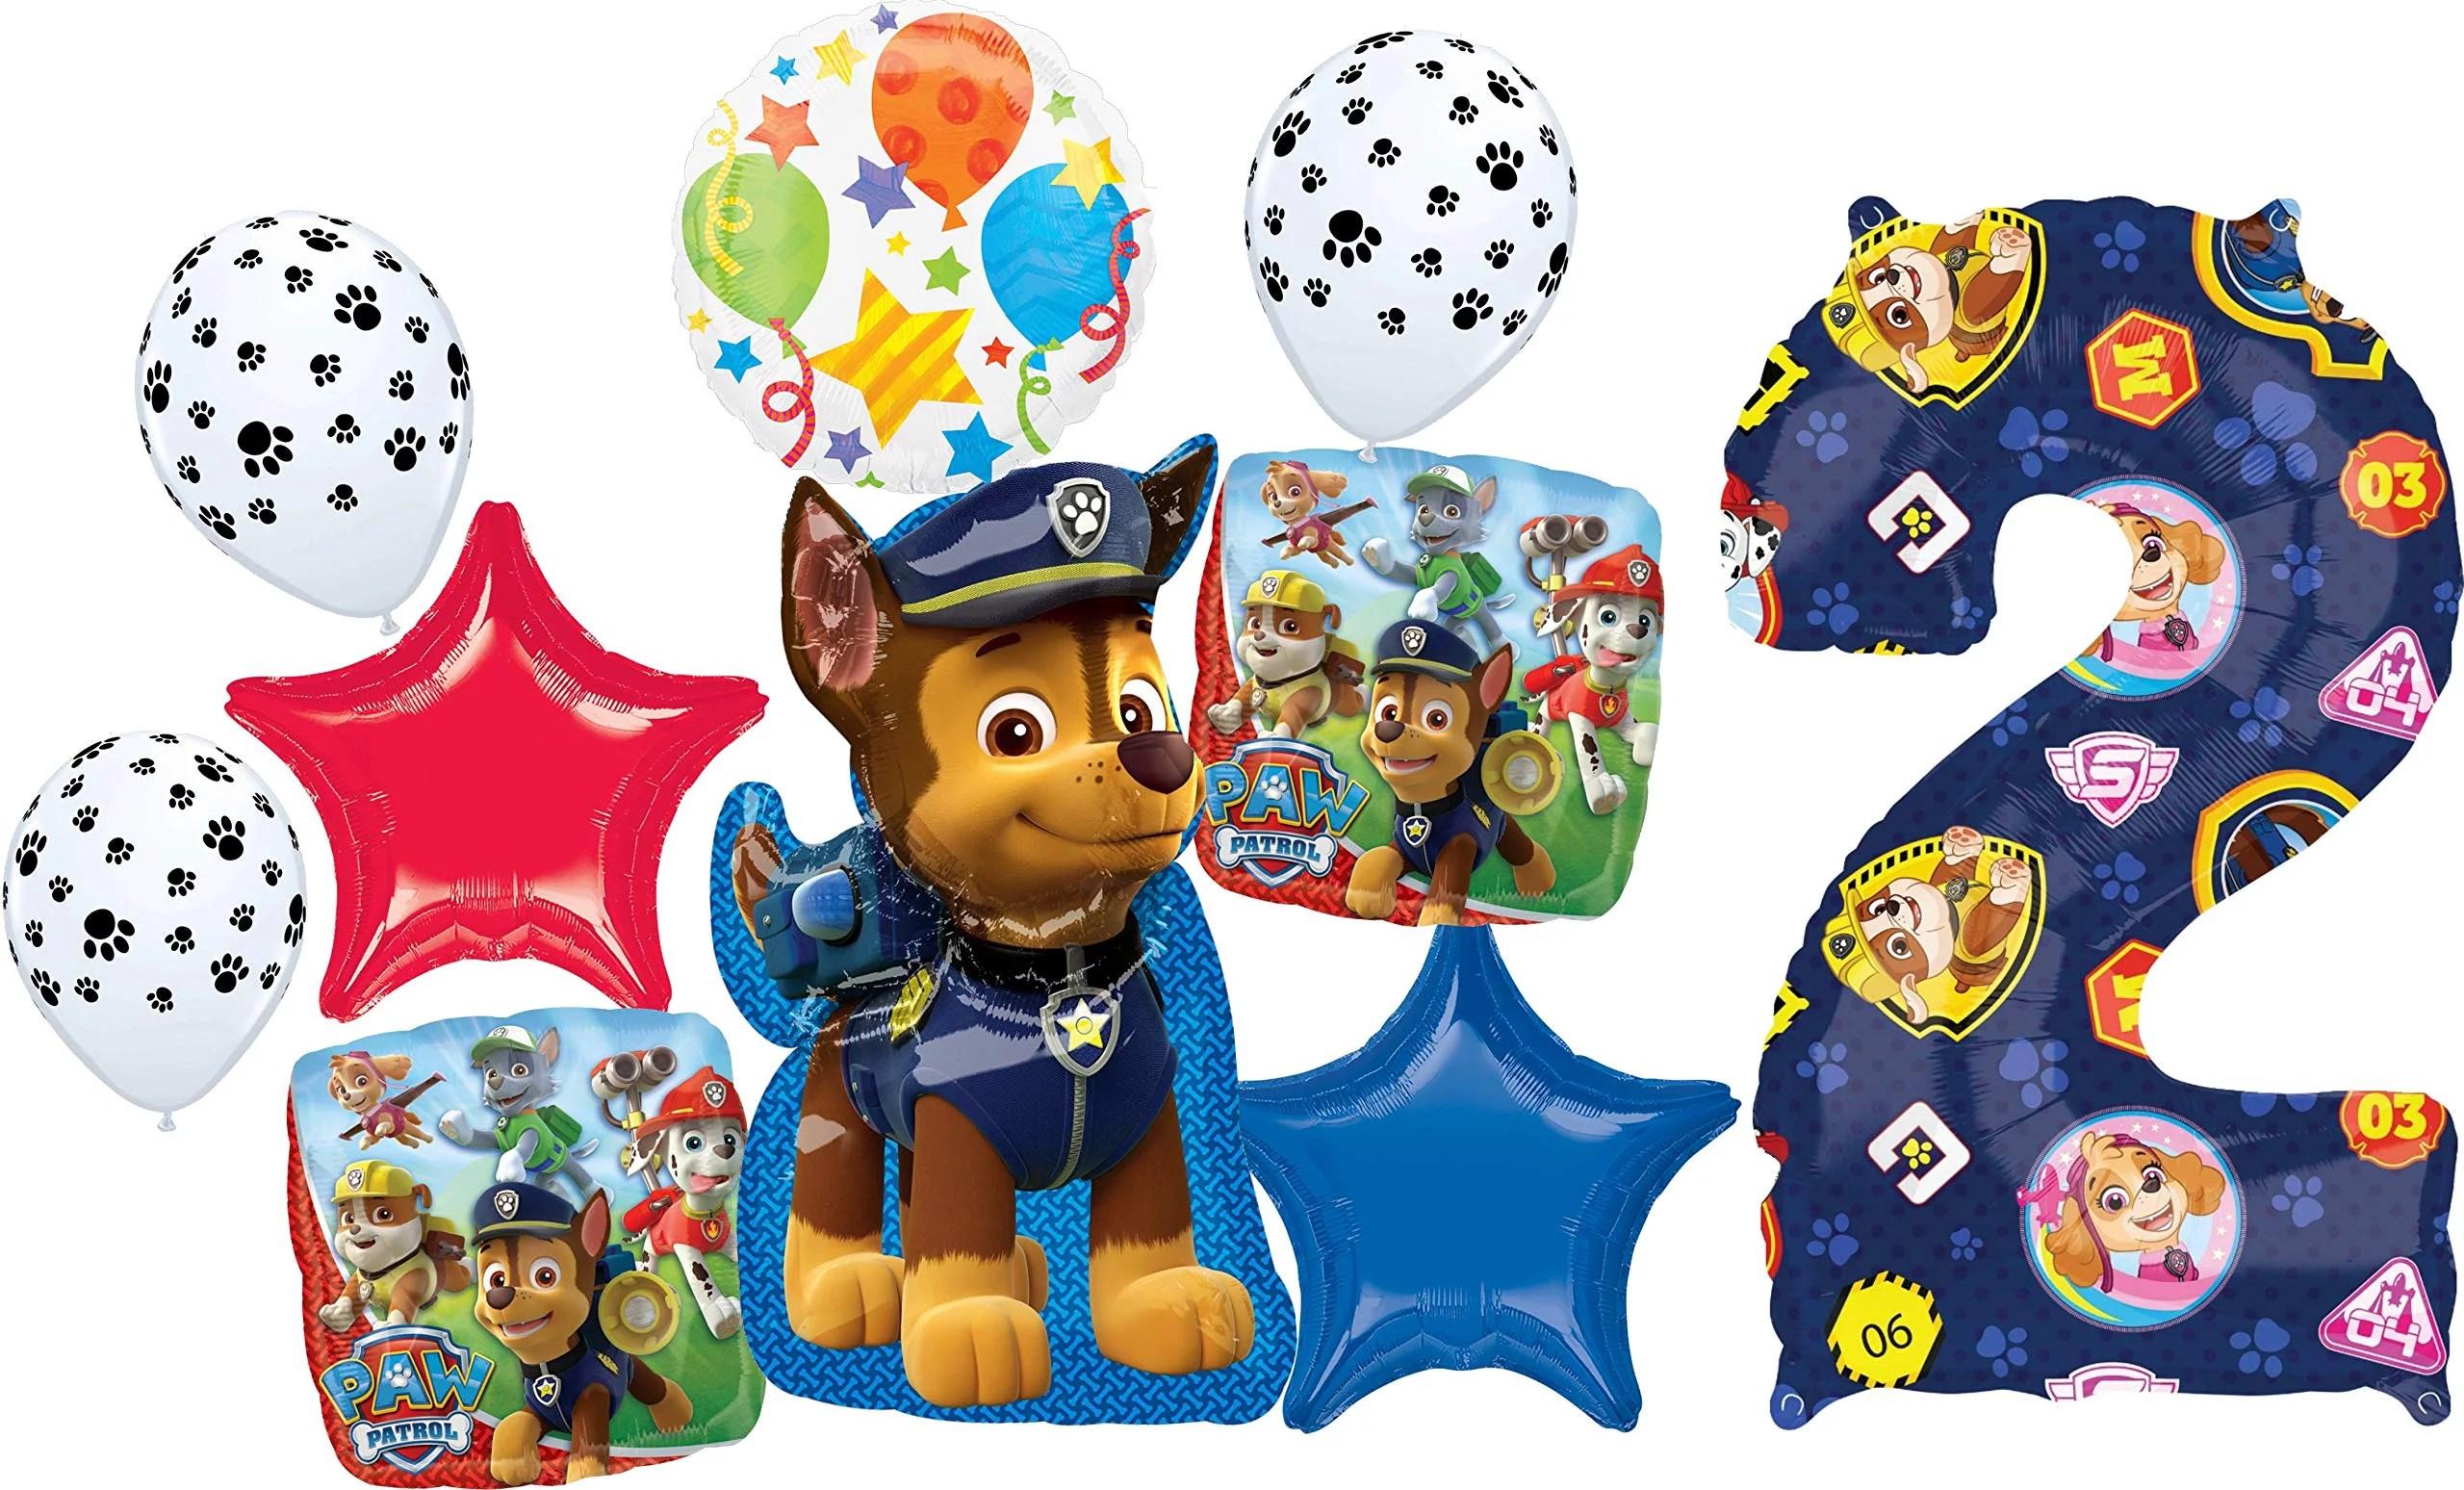 Paw Patrol Party Supplies 2nd Birthday Balloon Bouquet Decorations Walmart Com Walmart Com